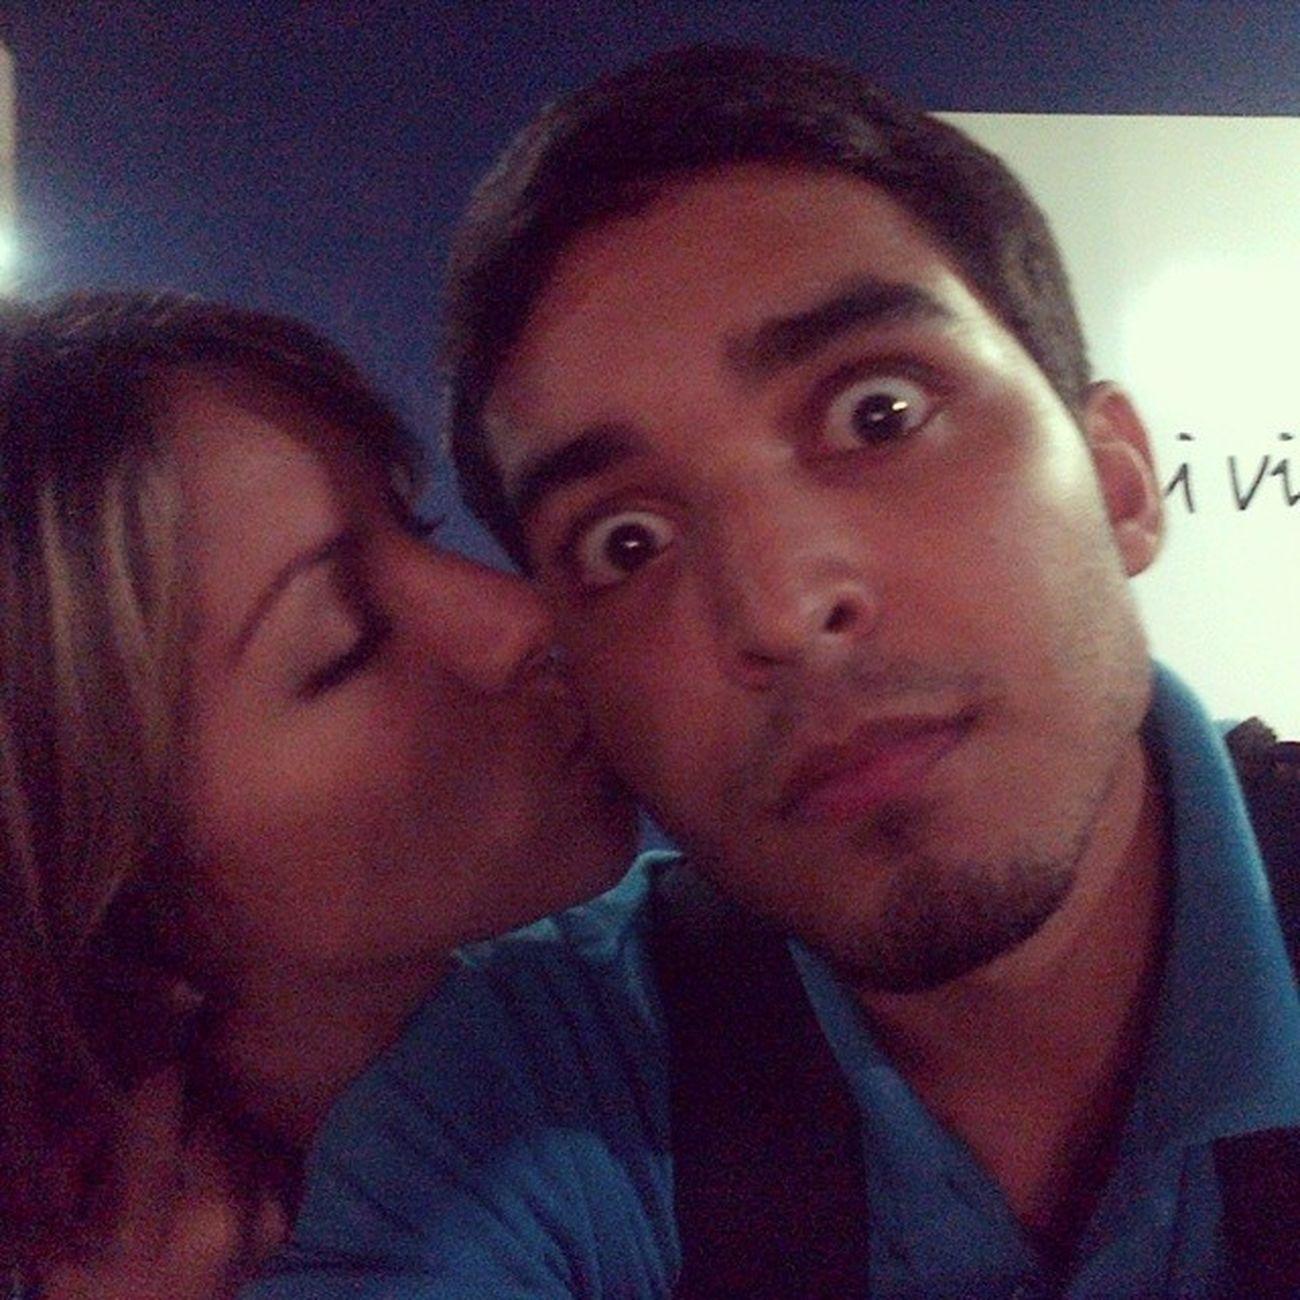 Jajajaja él siempre y sus caras ?? Nopuedoconél Tortus Memories Selfie couple old girl boy kiss weird funny moment date jw